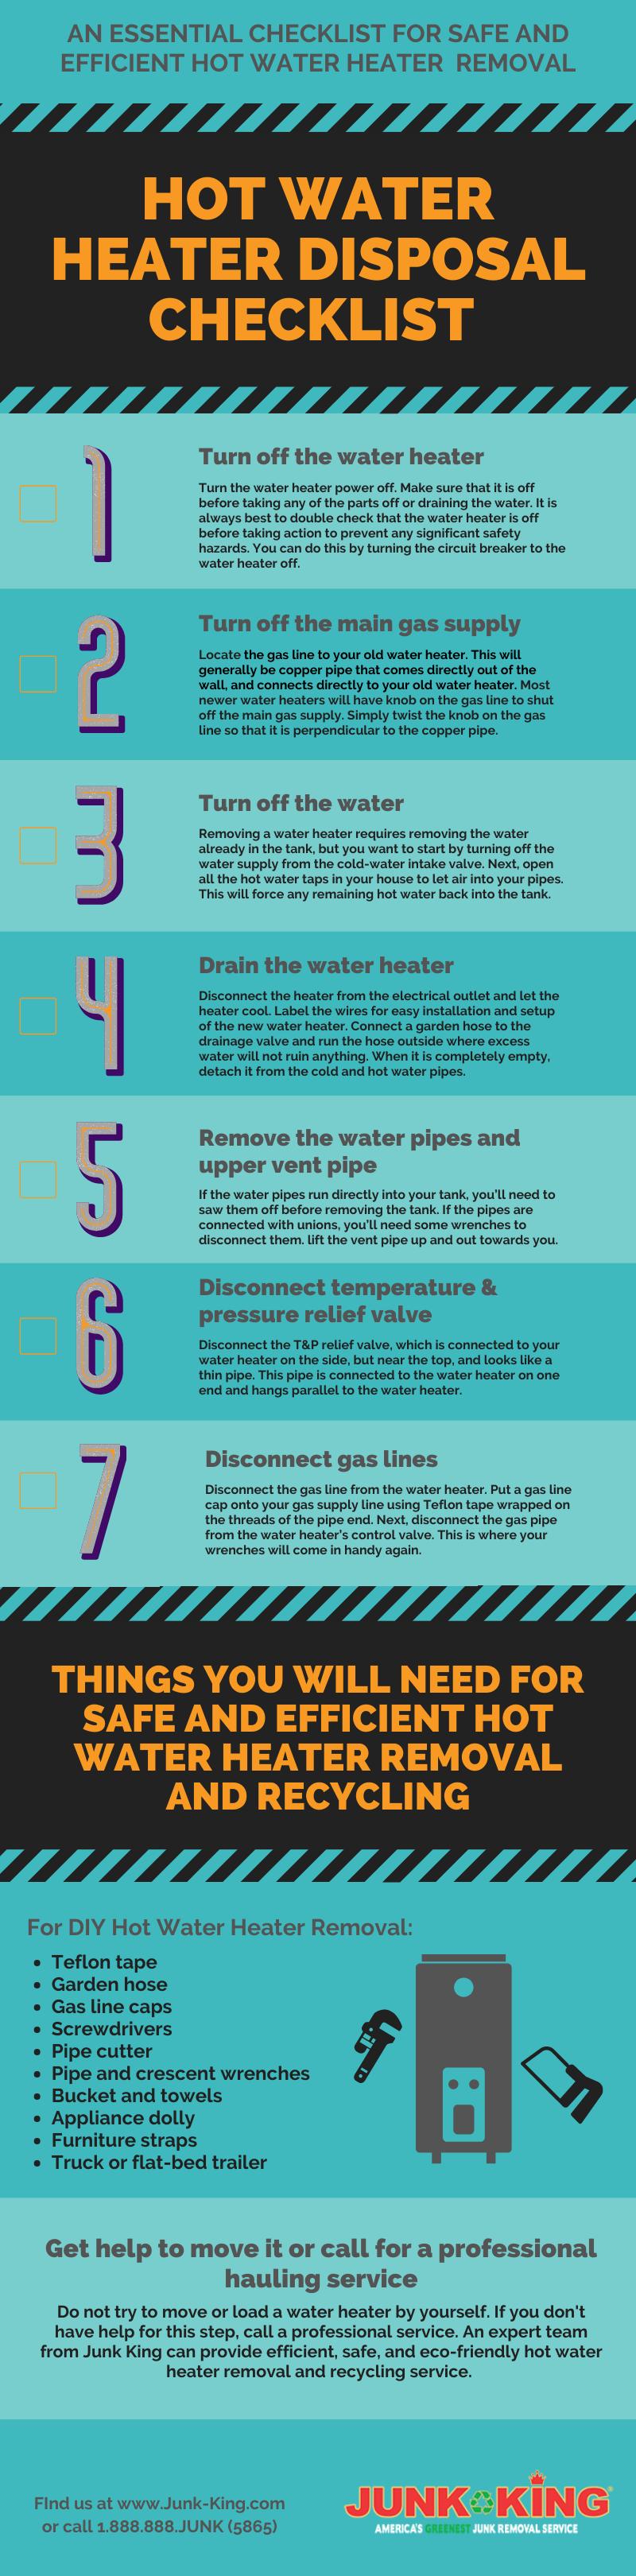 hot-water-heater-disposal-checklist